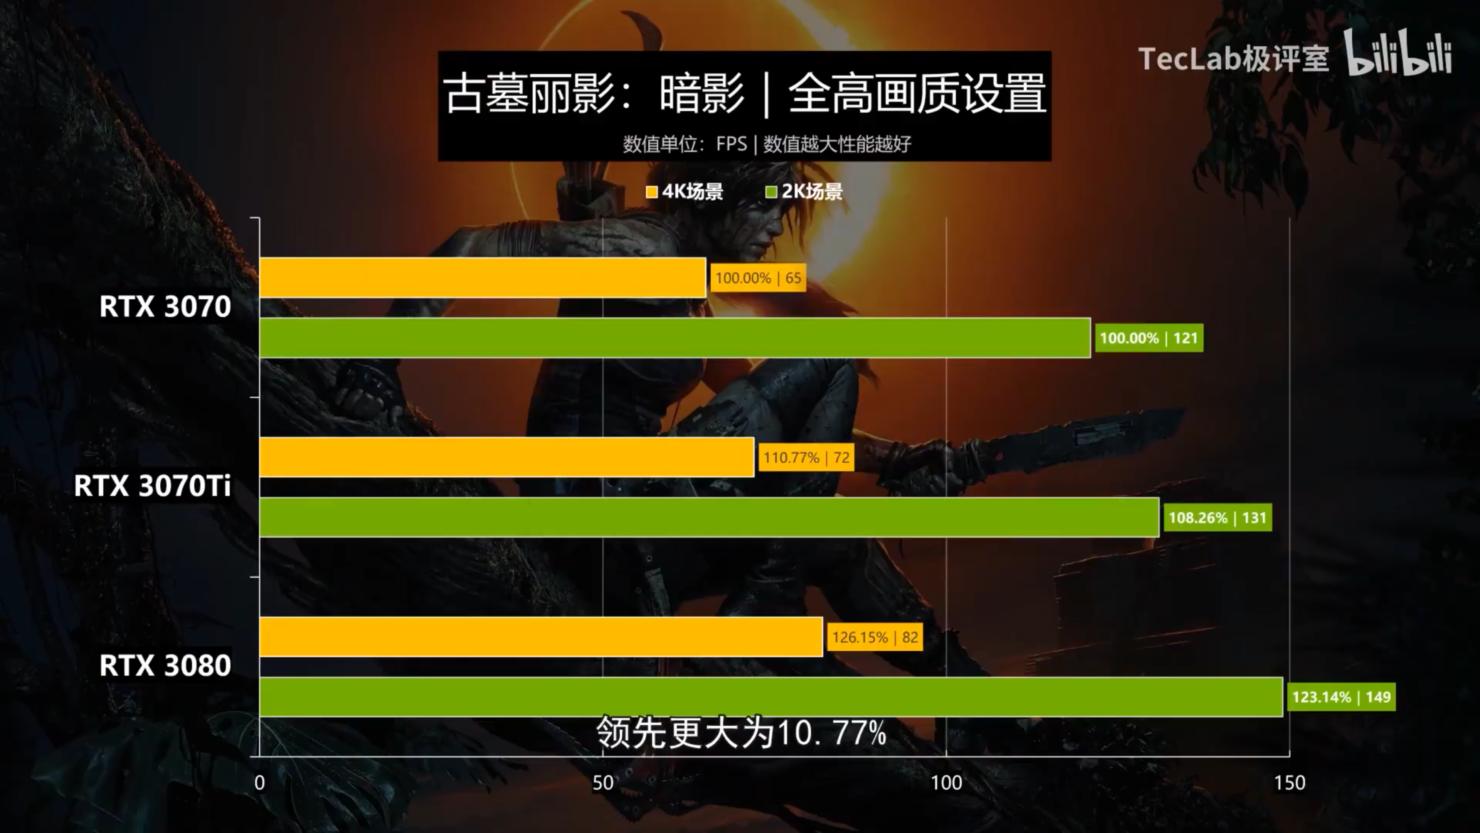 nvidia-geforce-rtx-3070-ti-graphics-card-benchmark-performance-leak-_shadow-of-the-tomb-raider